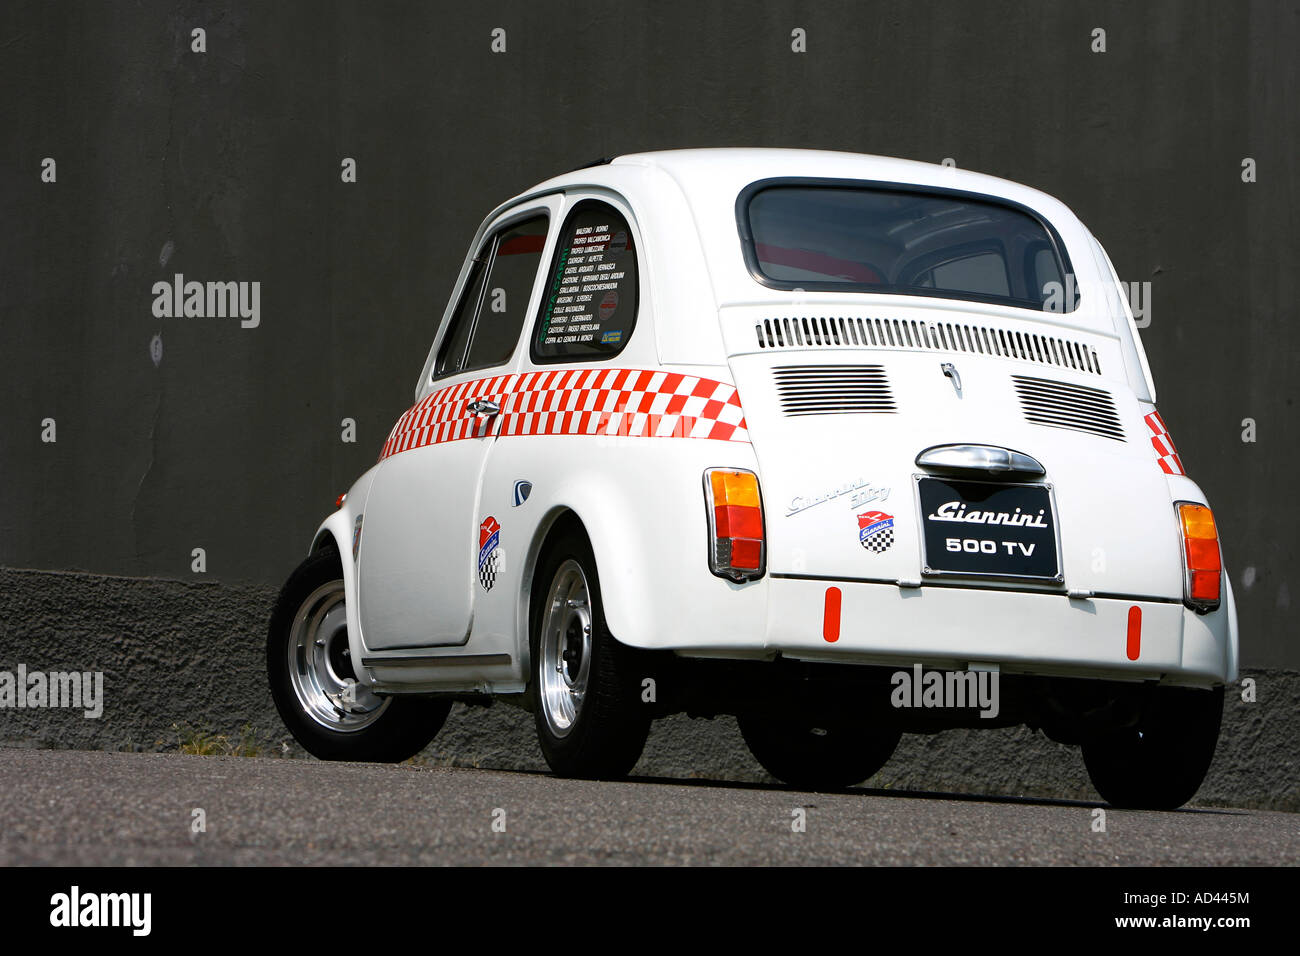 Fiat 500 Giannini Stock Photo 13298047 Alamy